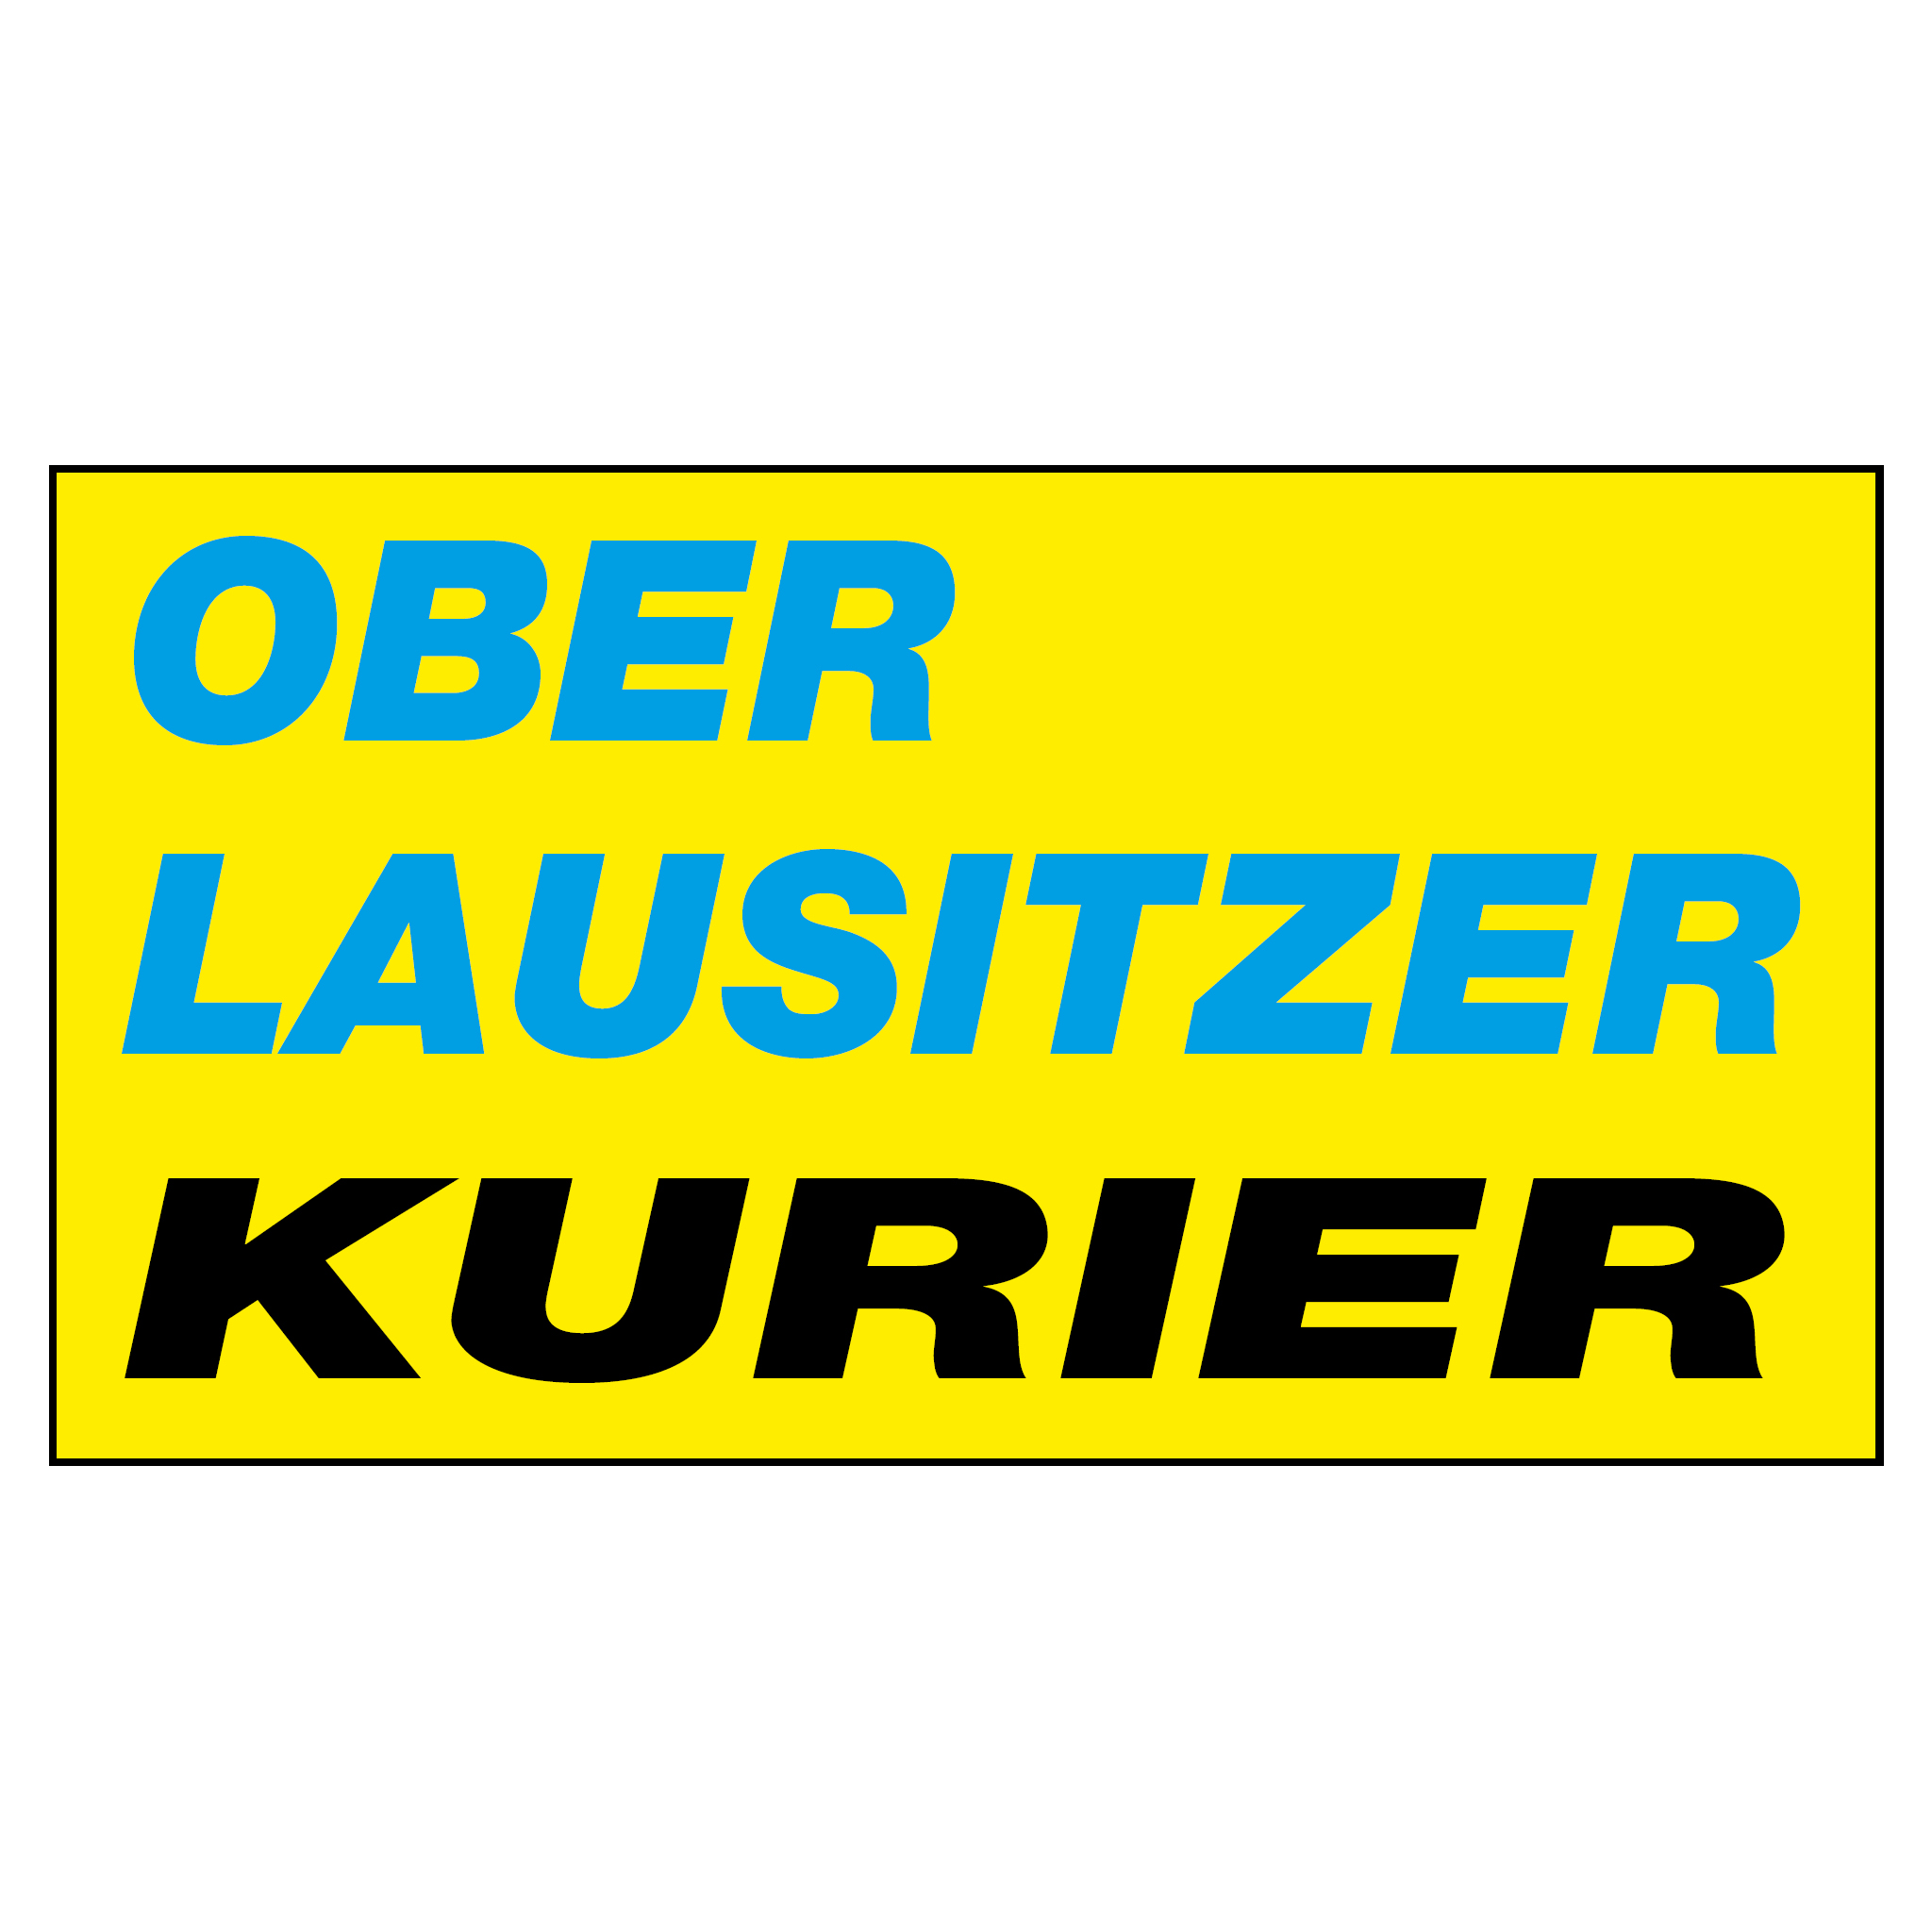 Oberlausitzer Kurier